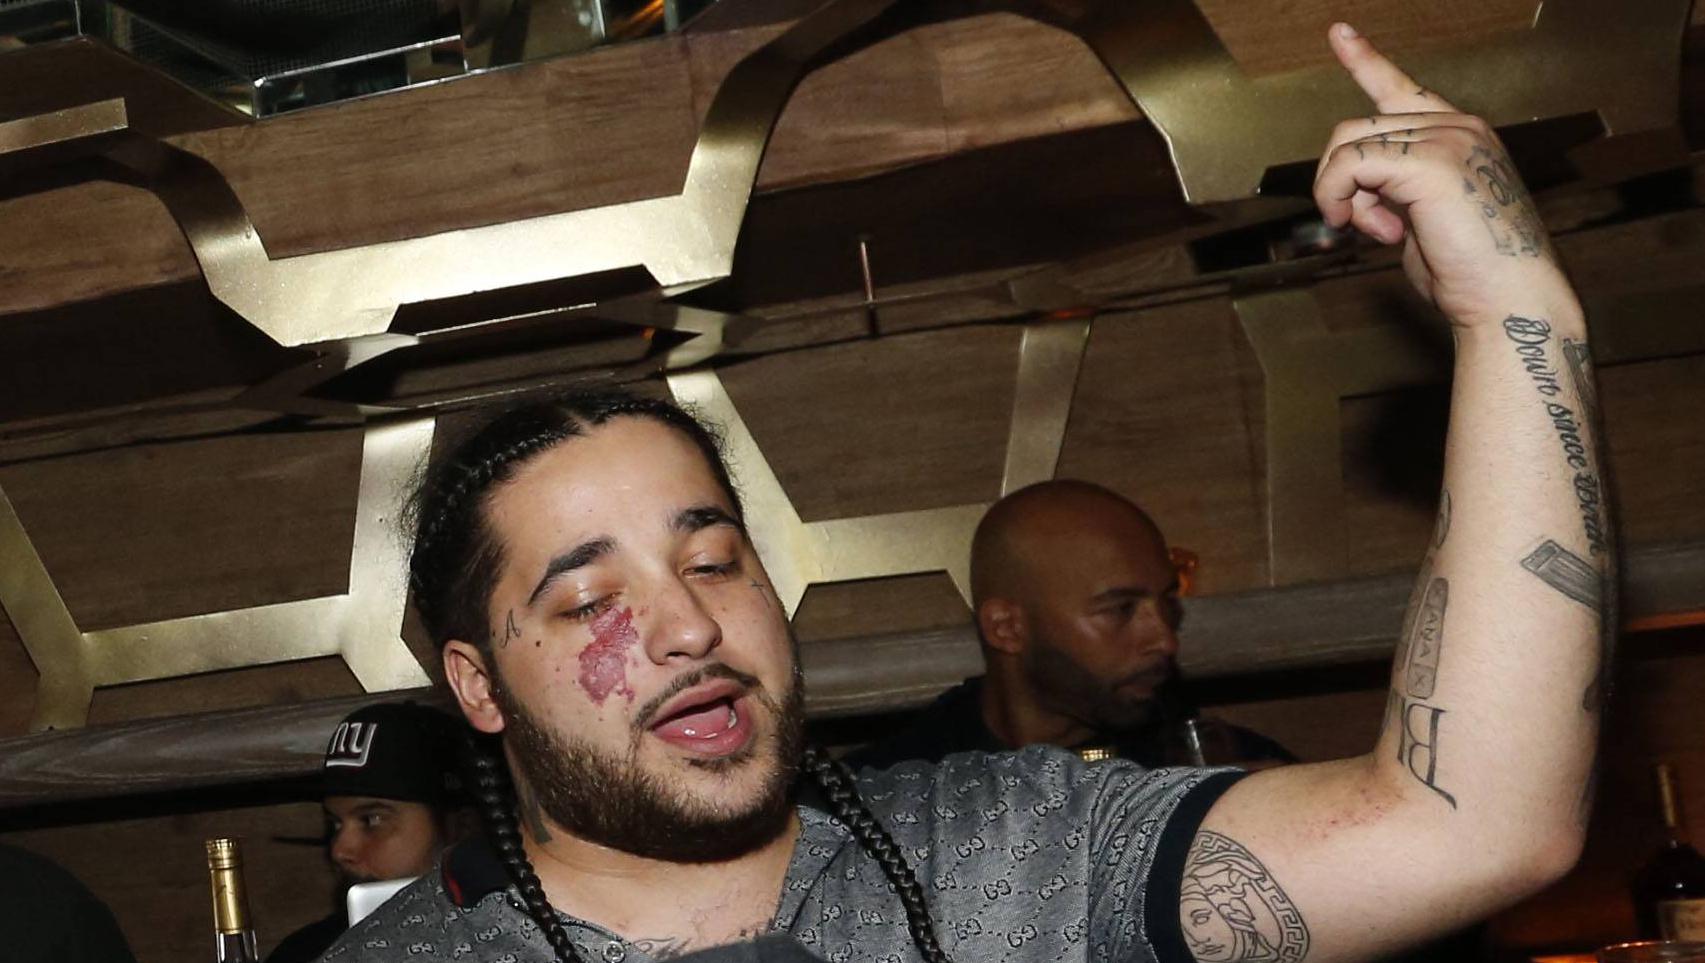 A$AP Yams, member of A$AP Mob, dies - CBS News